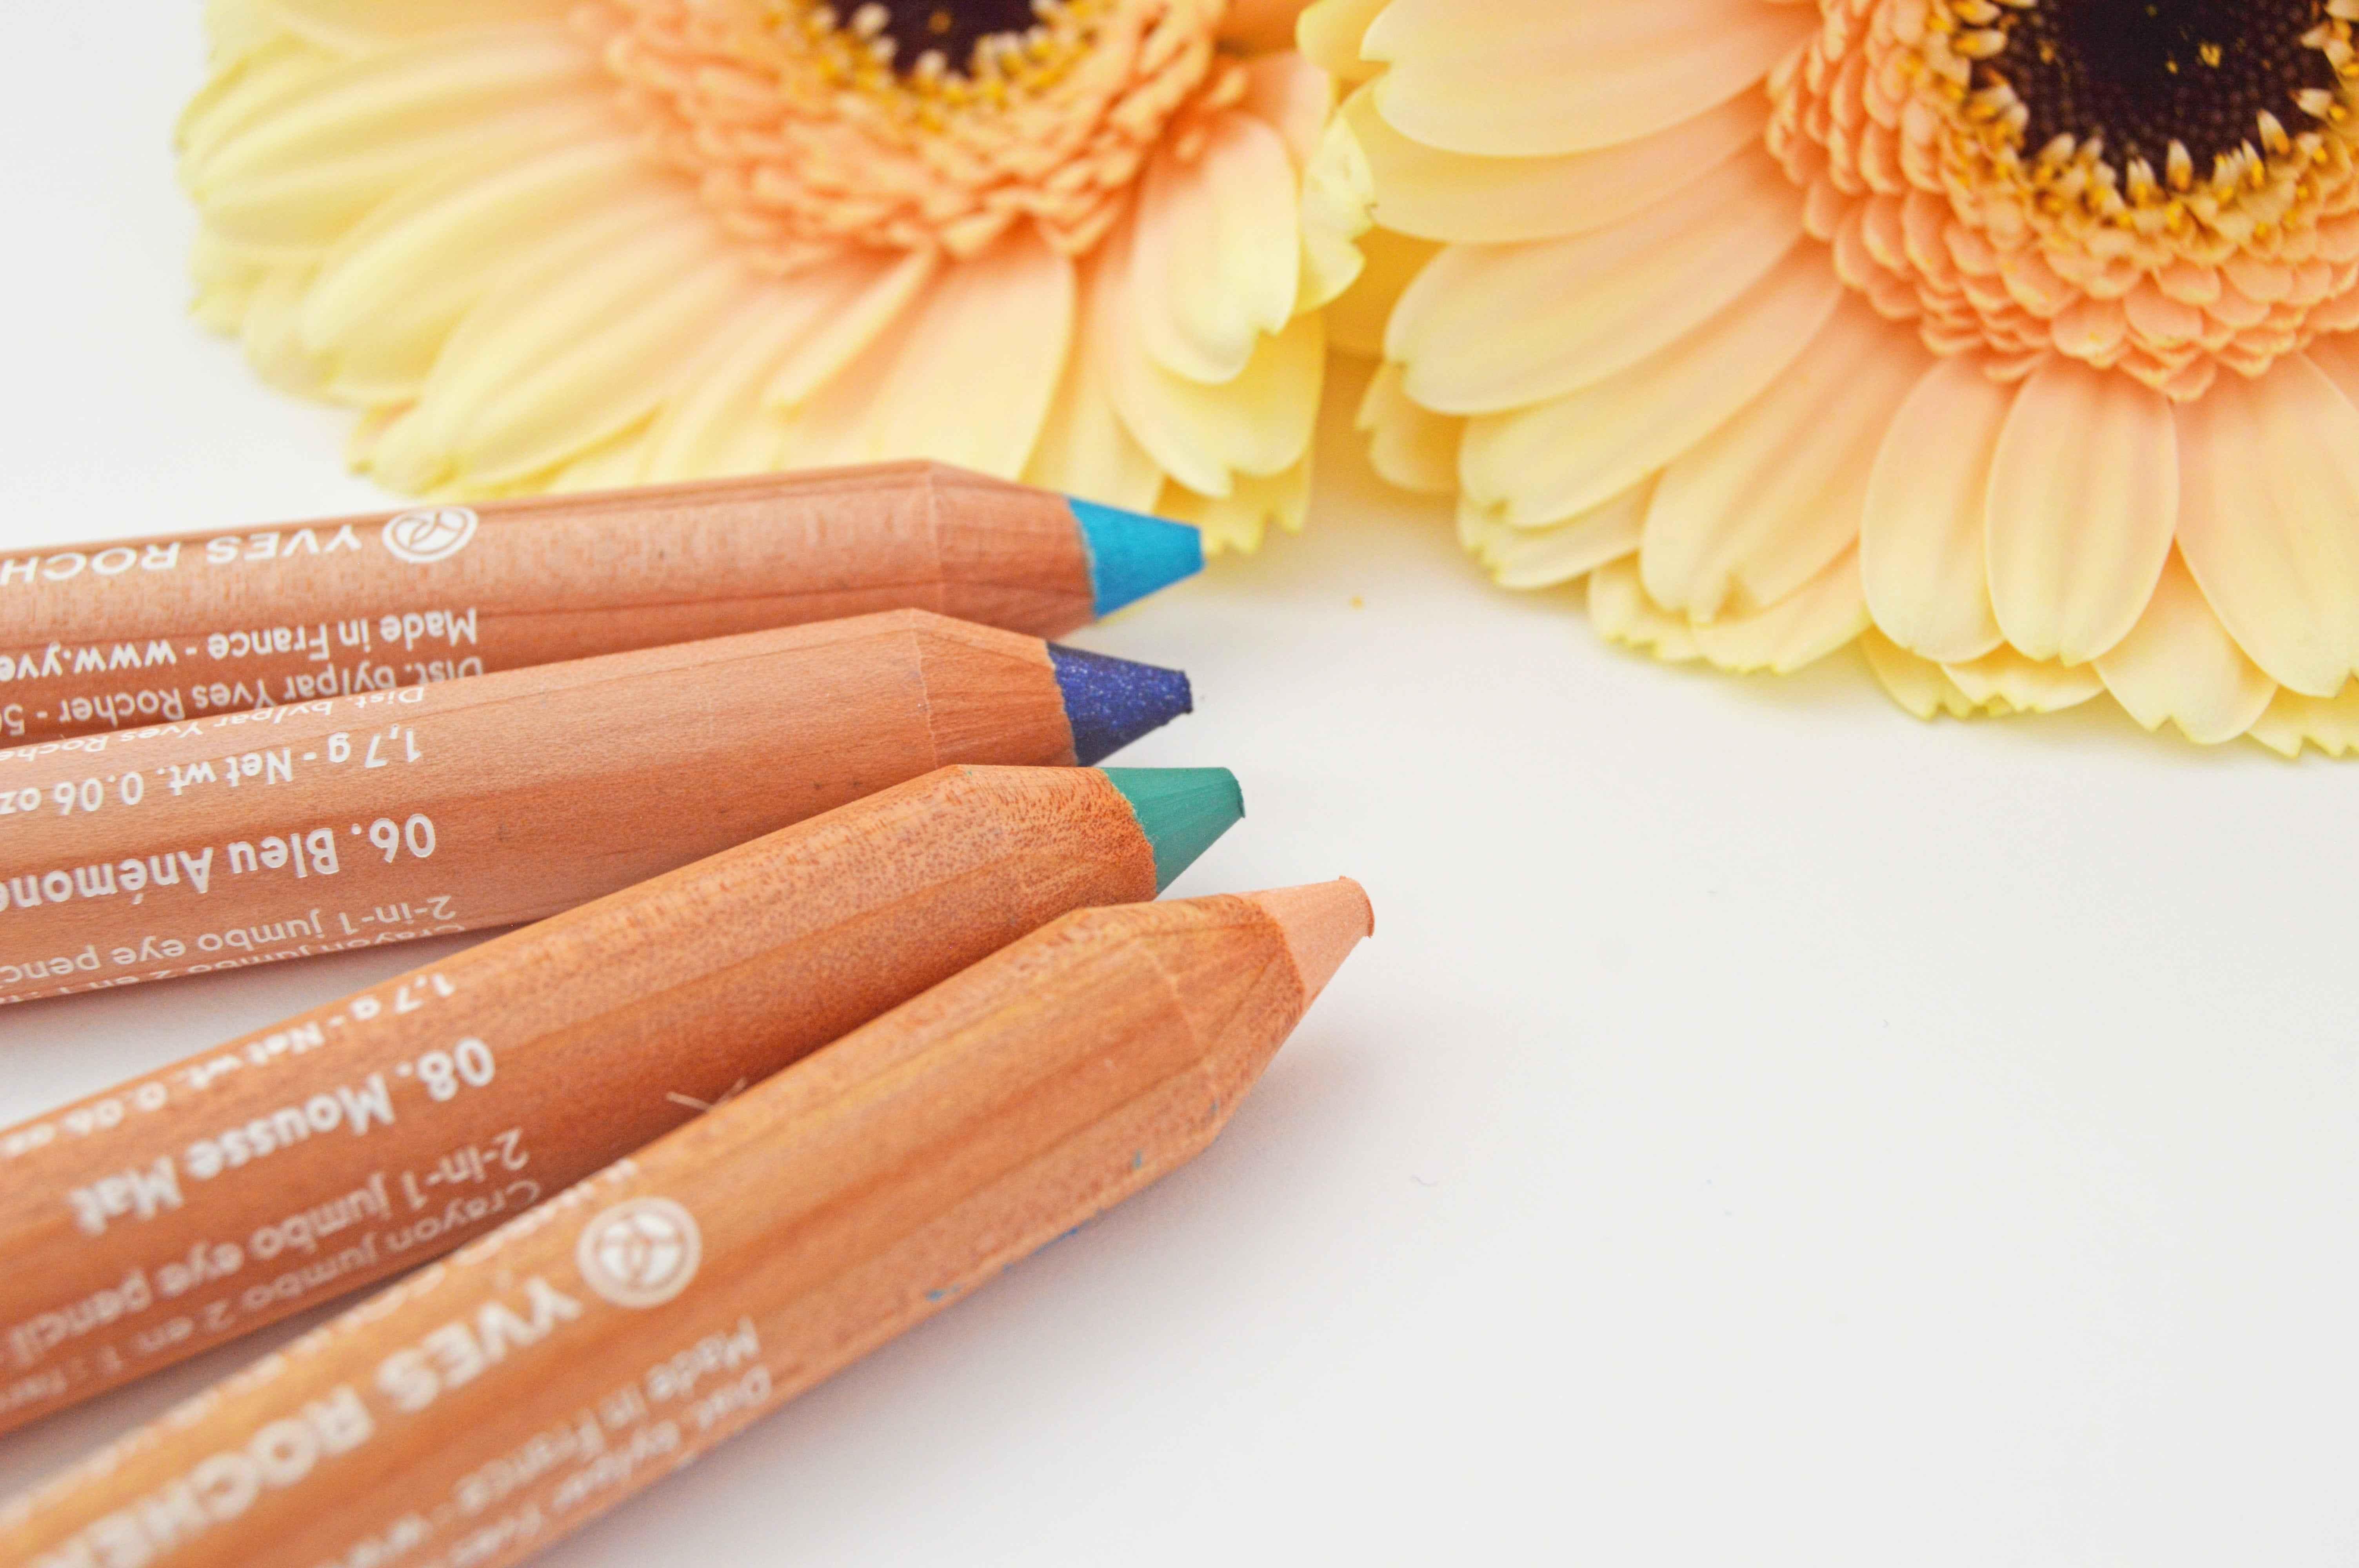 Yves Rocher - 2-in-1 Jumbo Eye Pencil